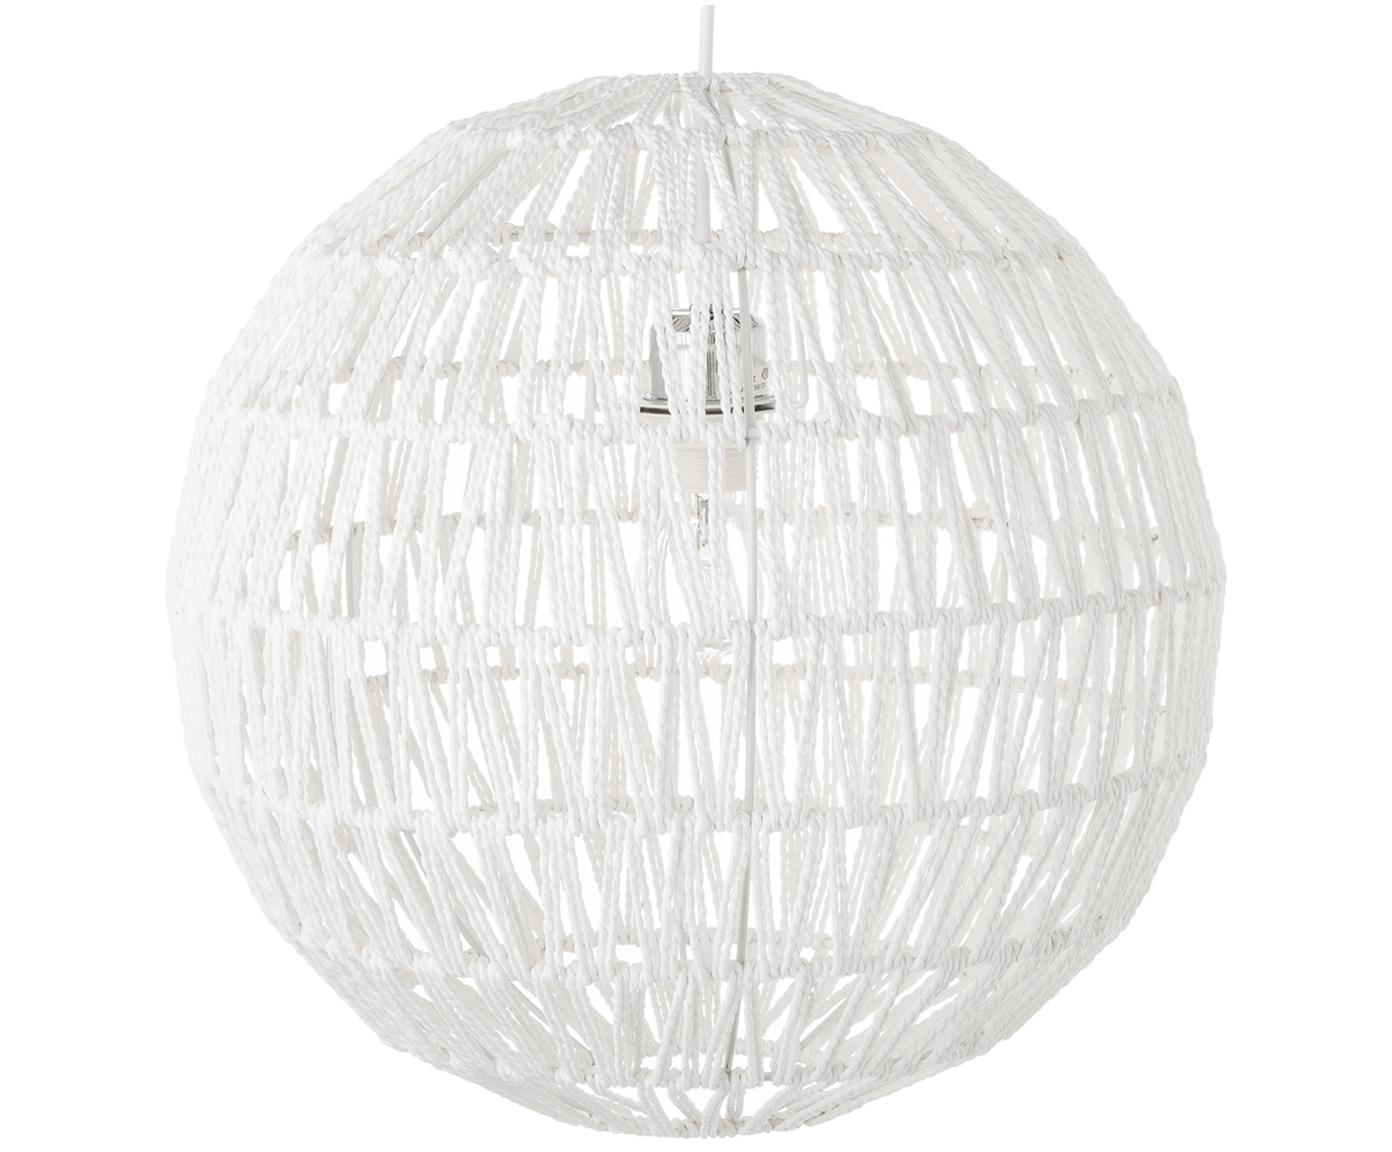 Pendelleuchte Cable aus Stoff, Metall, Textil, Weiß, Ø 40 x H 40  cm